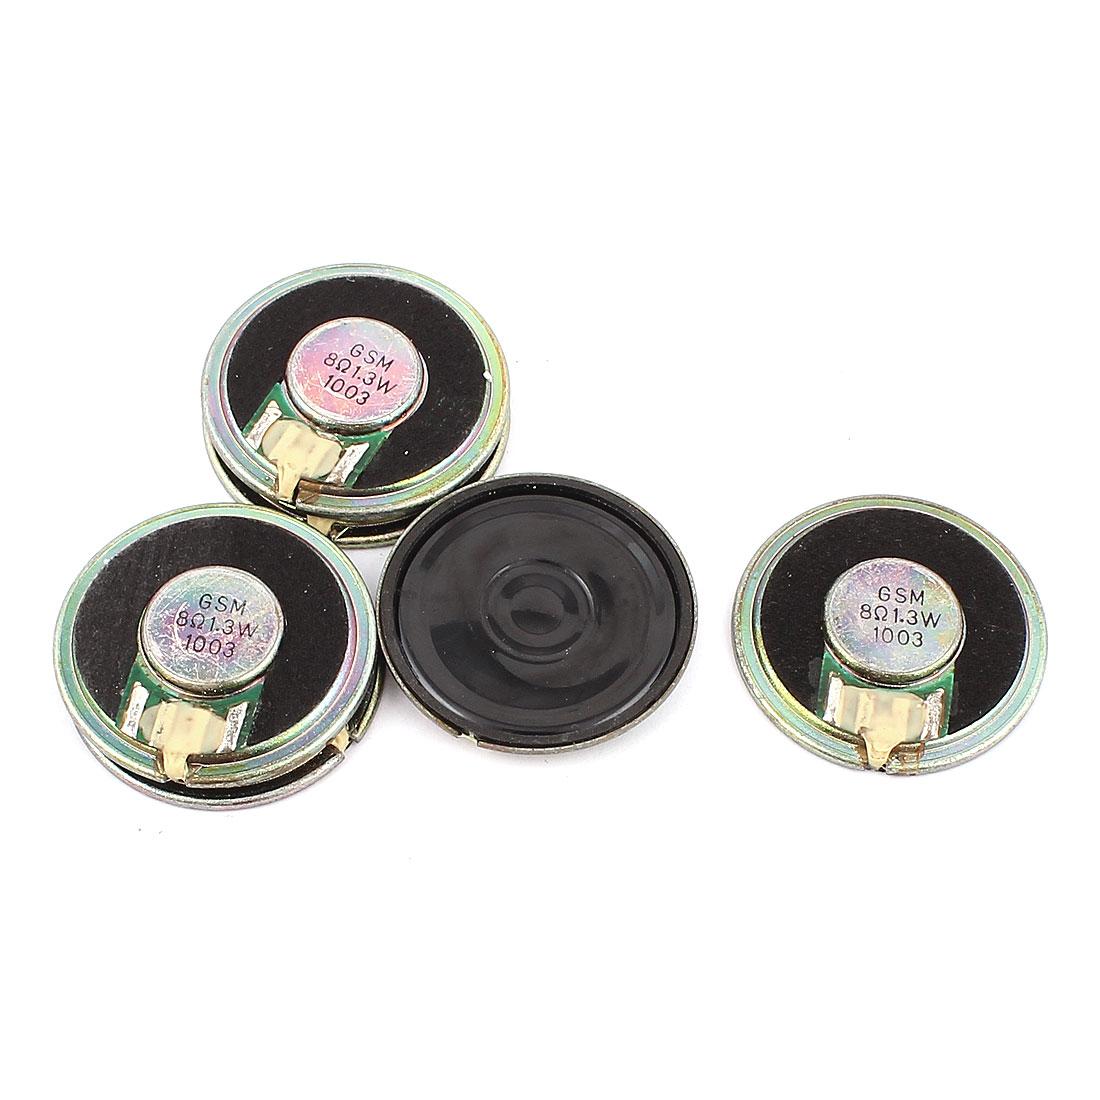 6 Pcs 36mm 8 Ohm 1.3W Metal Shell External Magnetic Speaker Loudspeaker Gold Tone